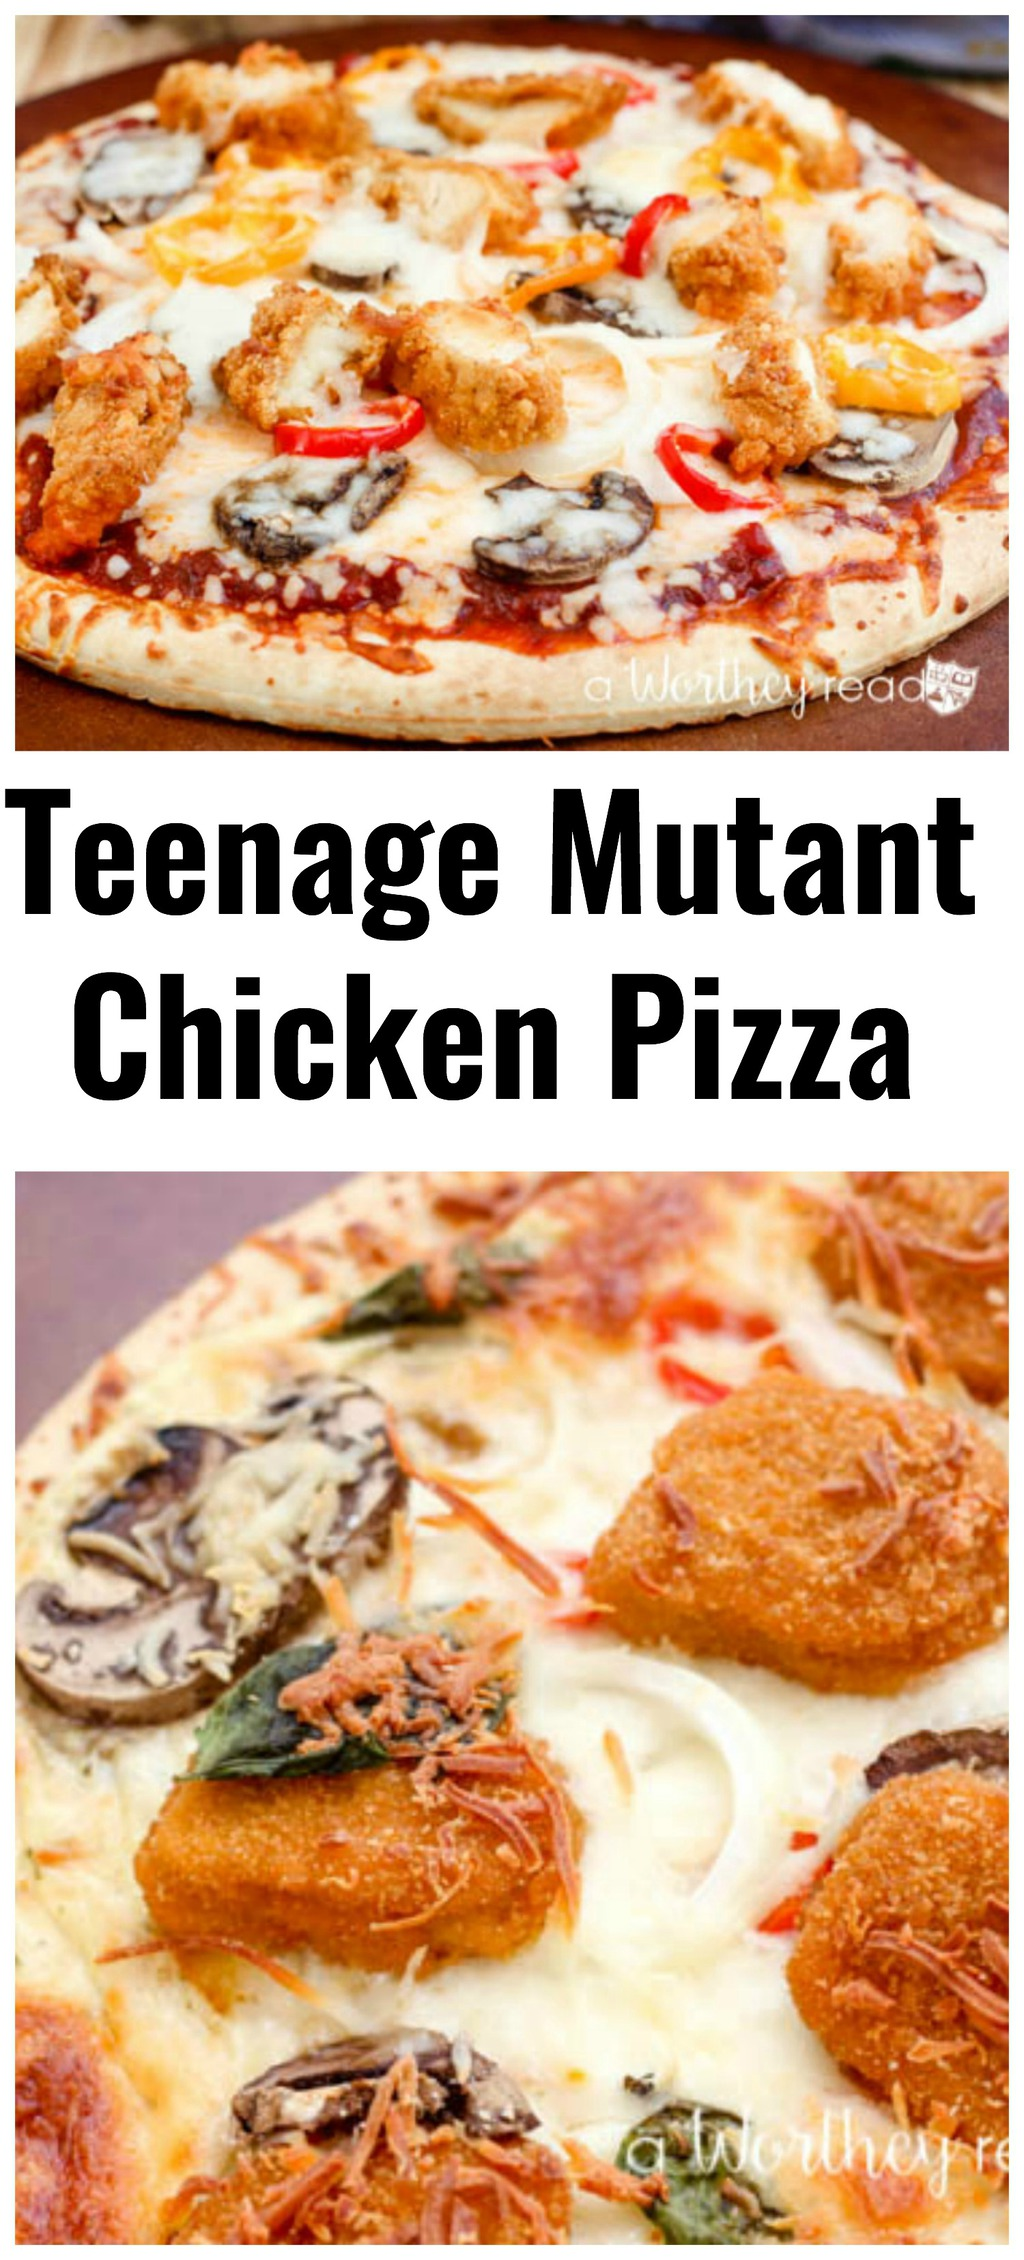 Easy Chicken Pizza Recipe Inspired by Teenage Mutant Ninja Turtles